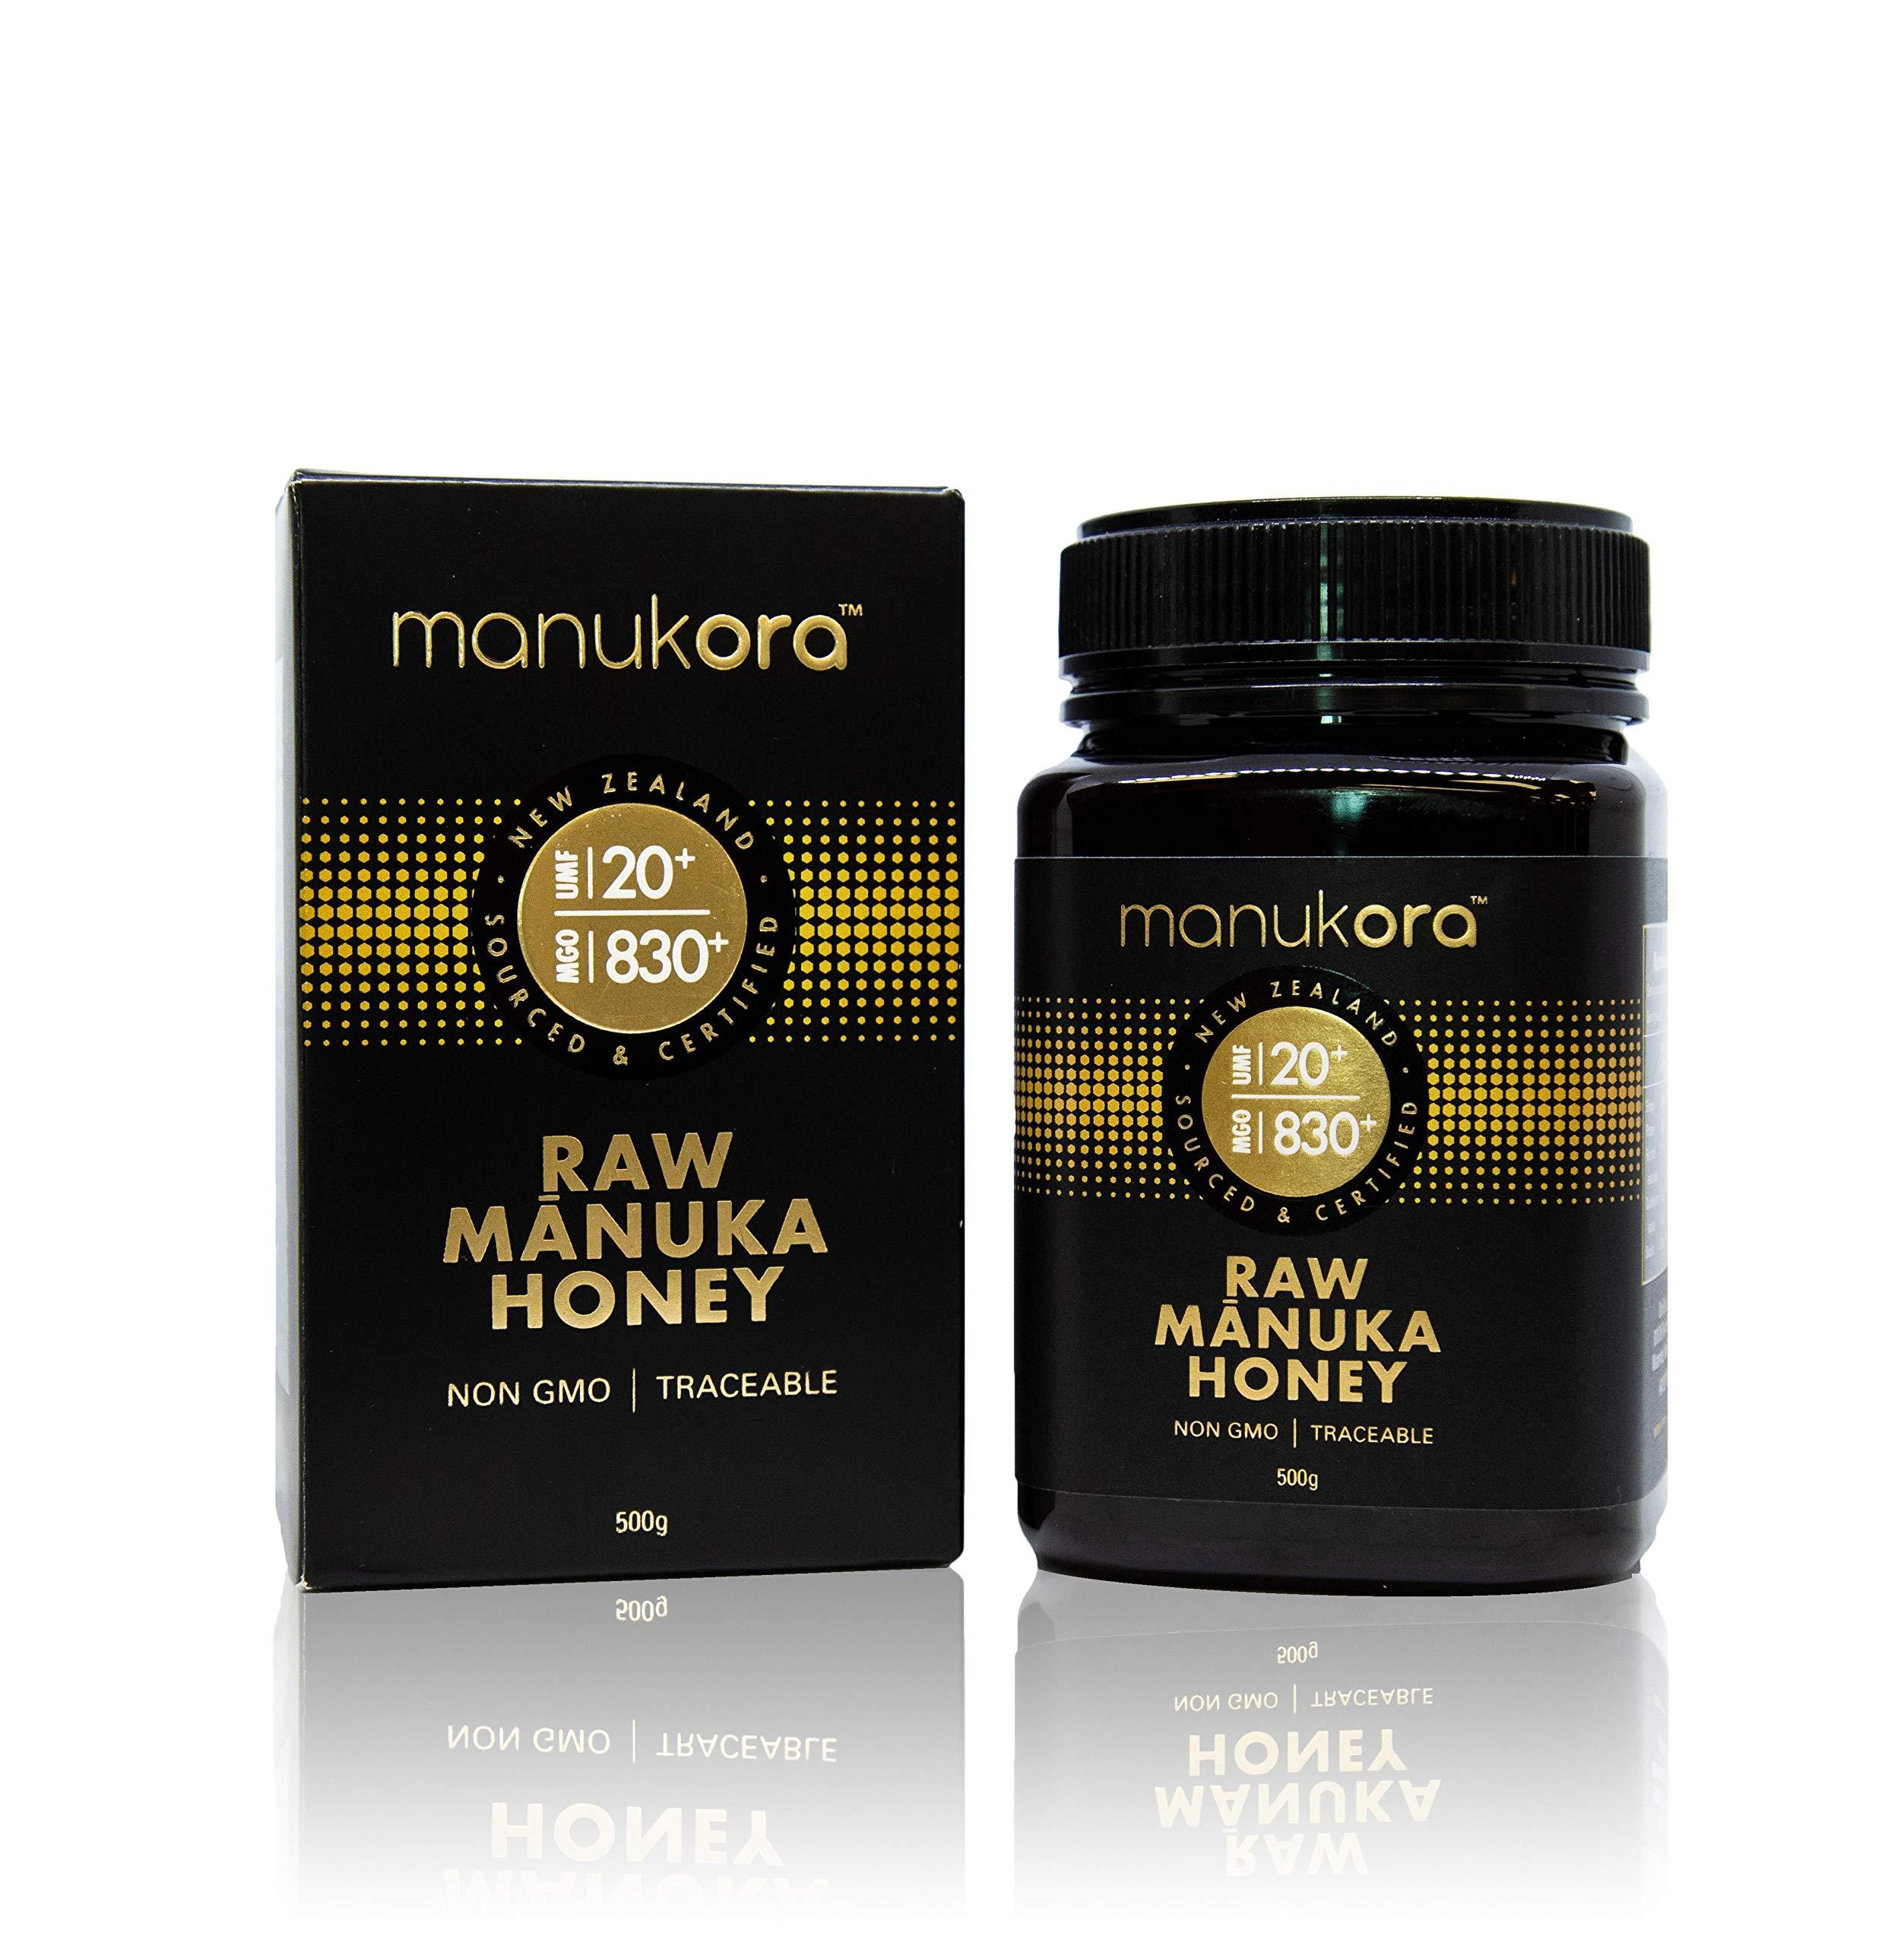 Manukora UMF 20+/MGO 830+ Raw Mānuka Honey (500g/1.1lb) Authentic Non-GMO New Zealand Honey, UMF & MGO Certified, Traceable from Hive to Hand by Manukora (Image #2)